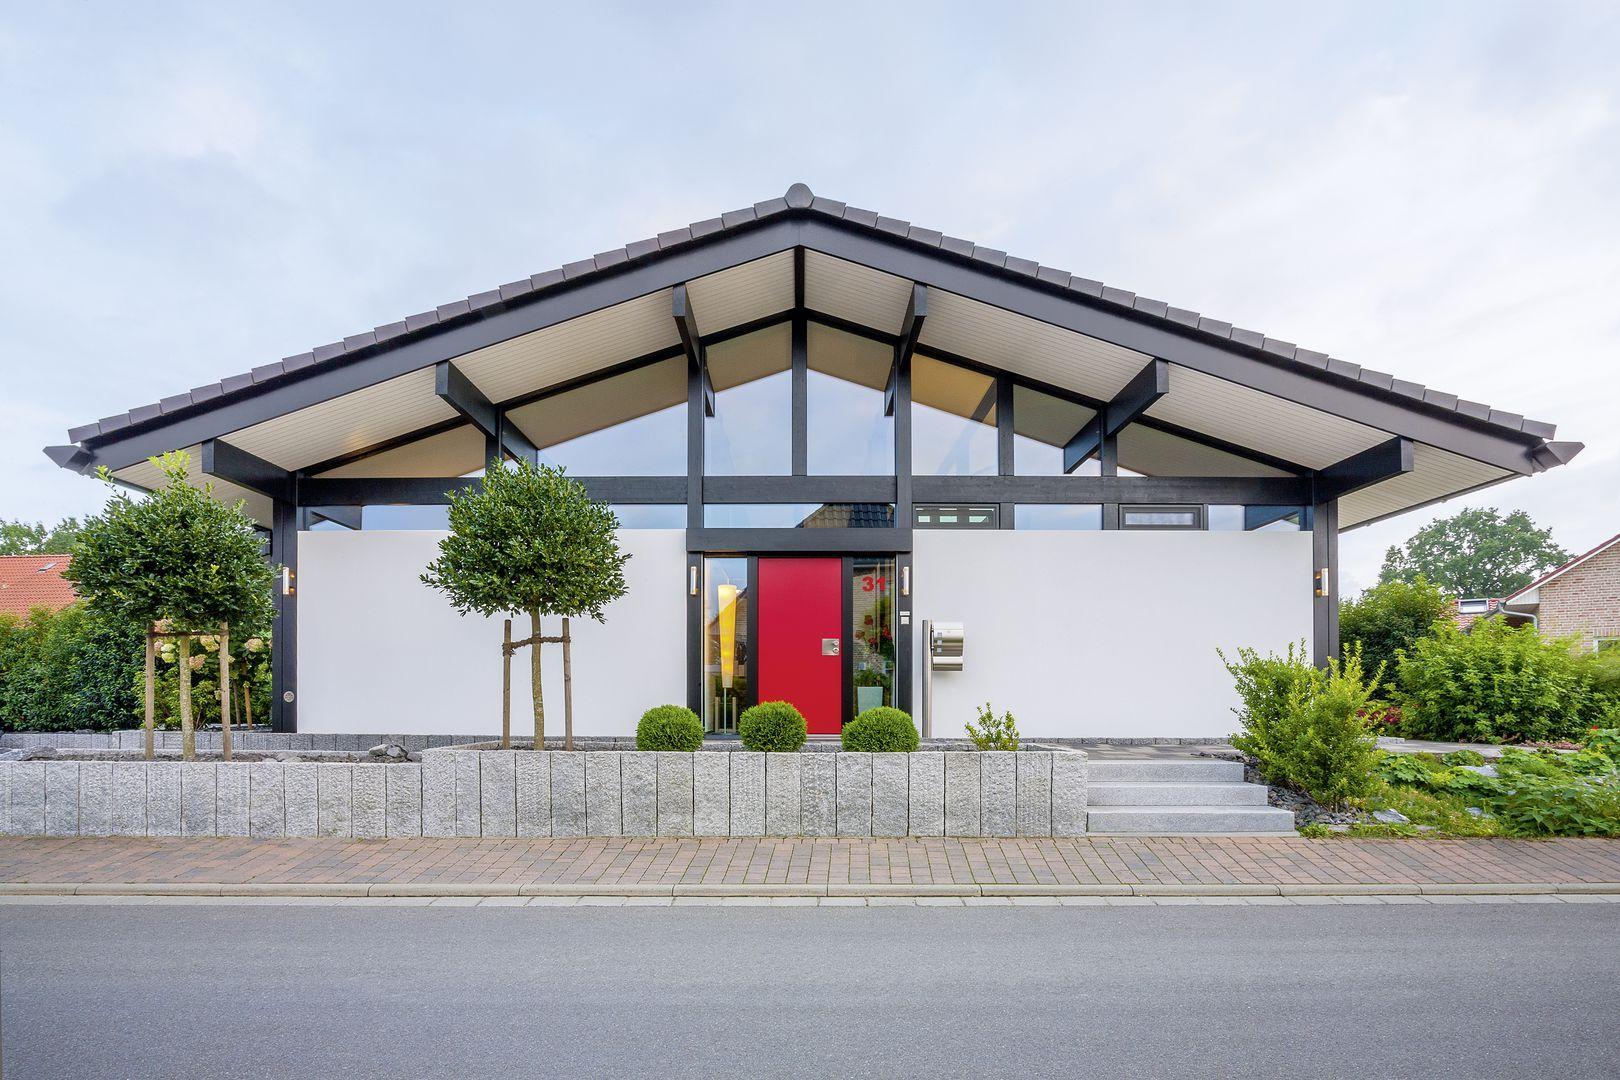 Modernes Hausdesign – Fotos zu Bewundern - Trendomat.com